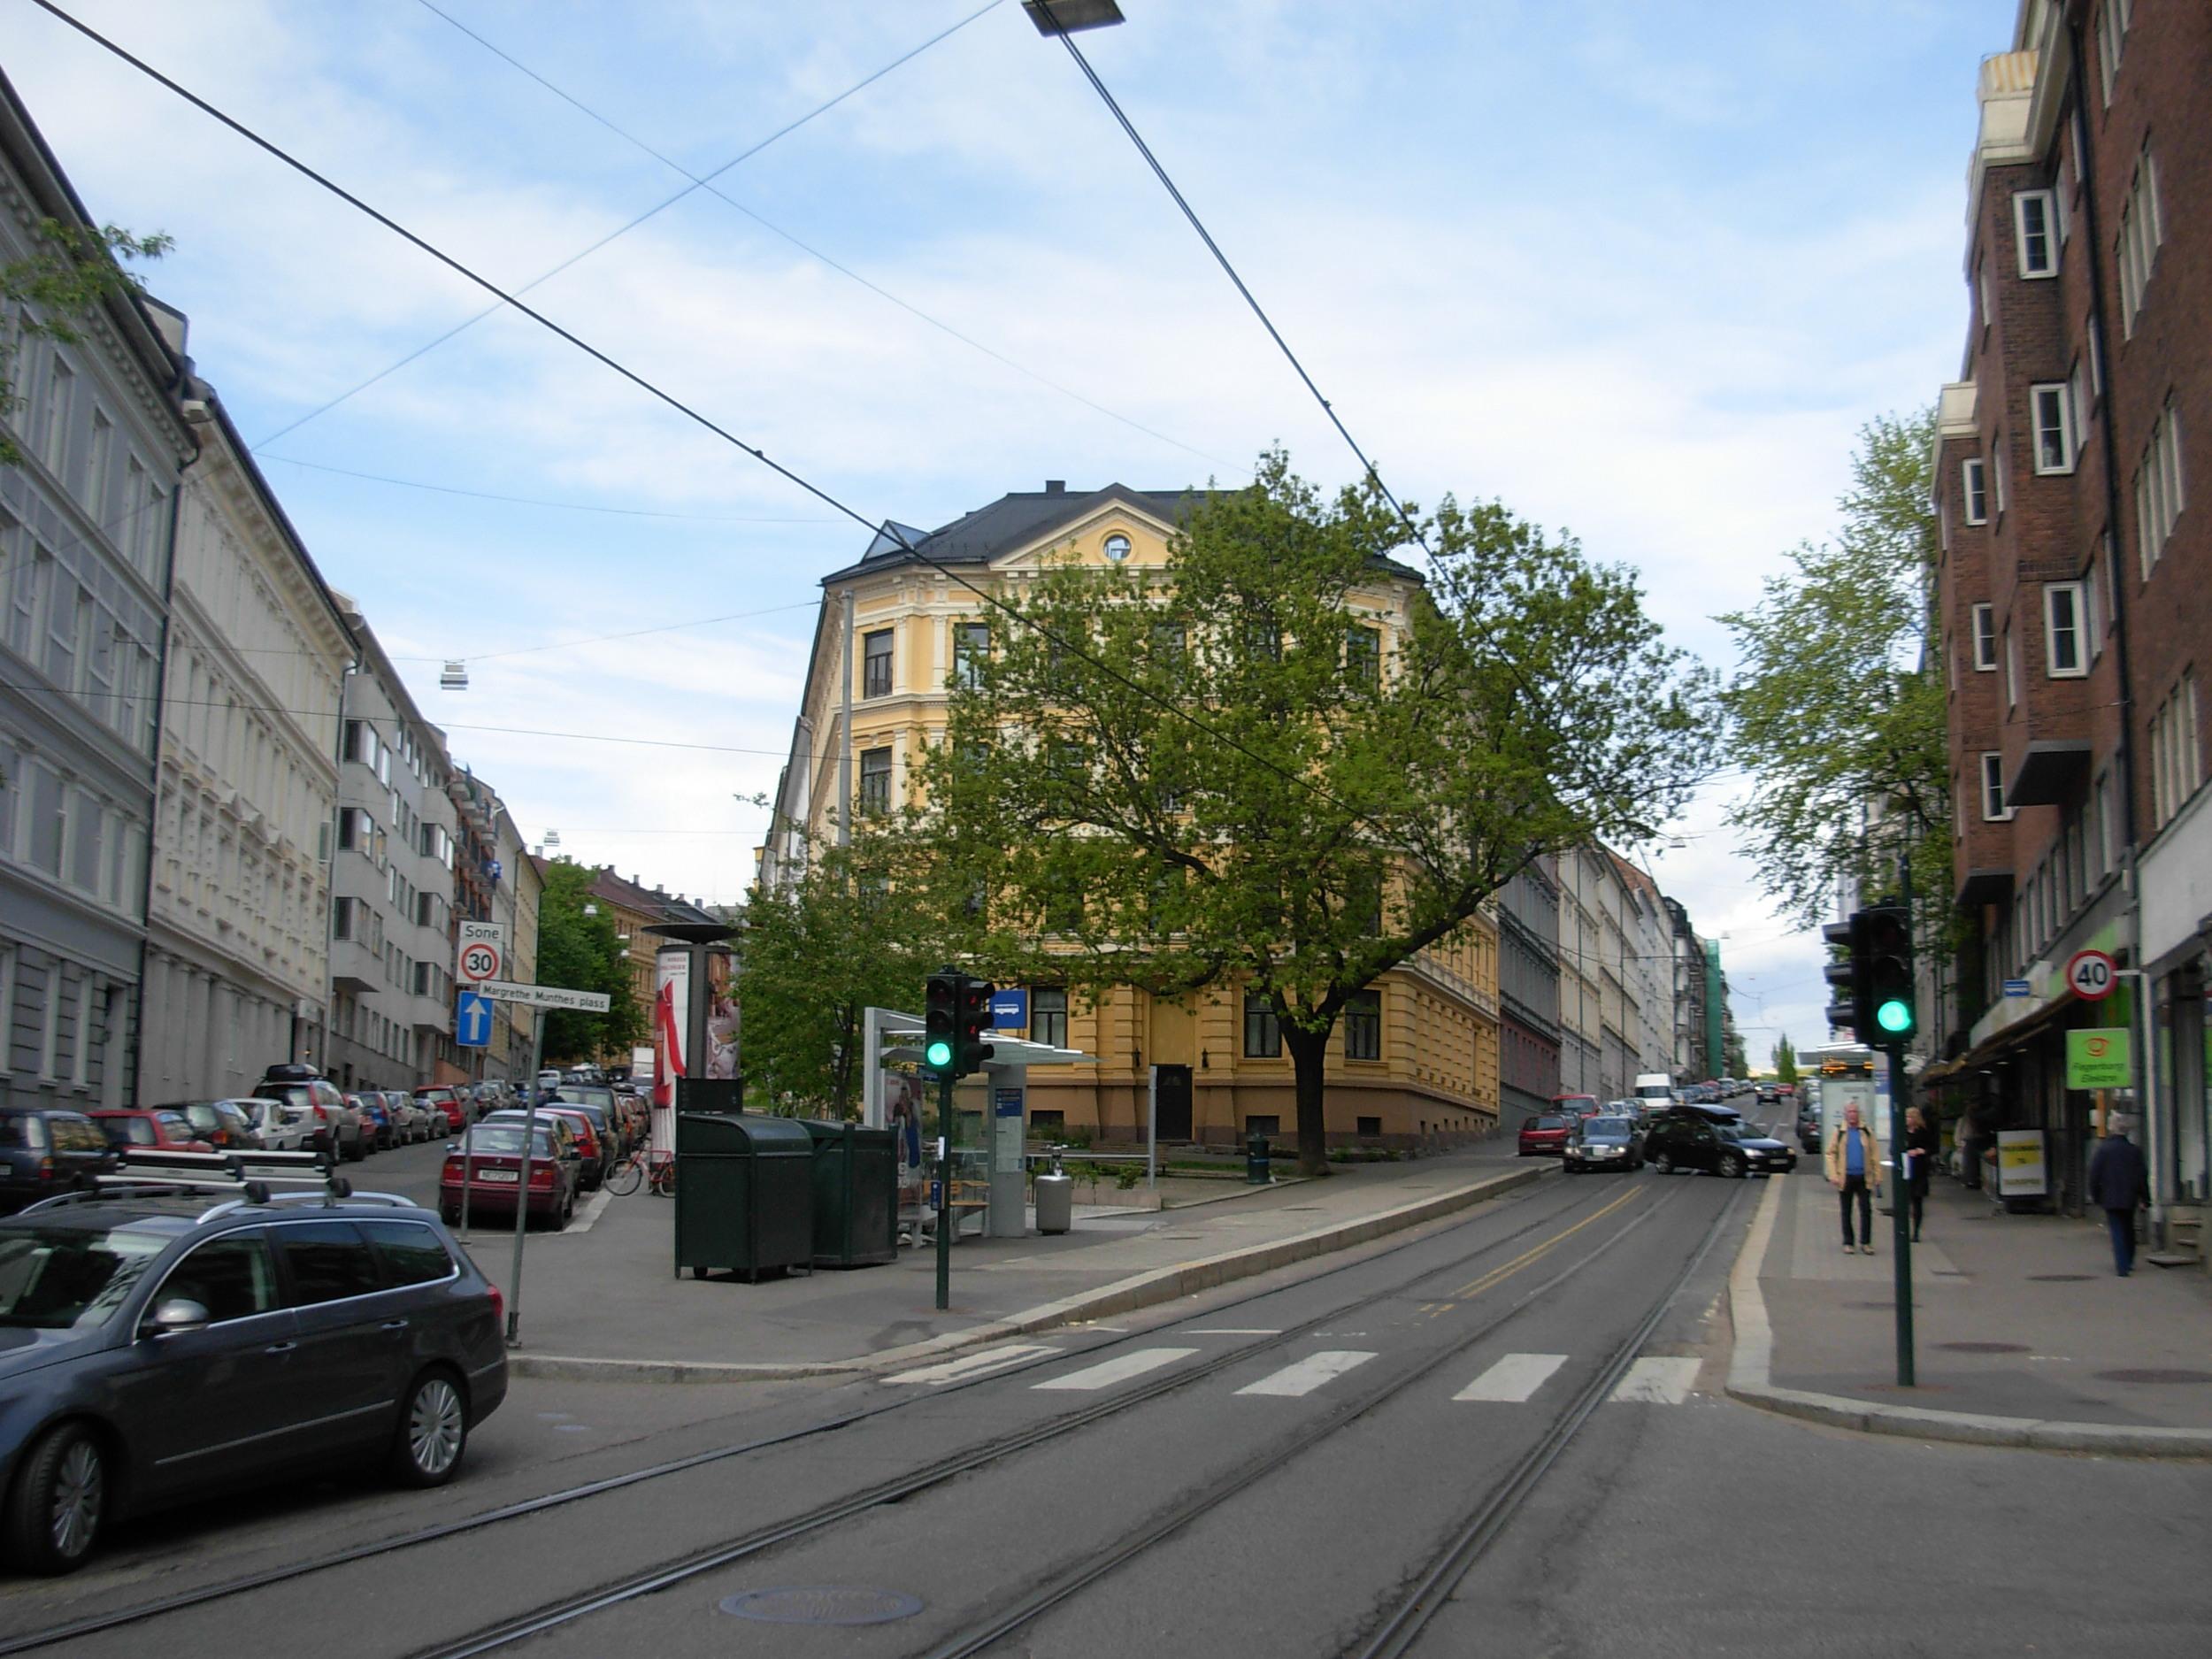 Foto: Helge Høifødt/Creative Commons